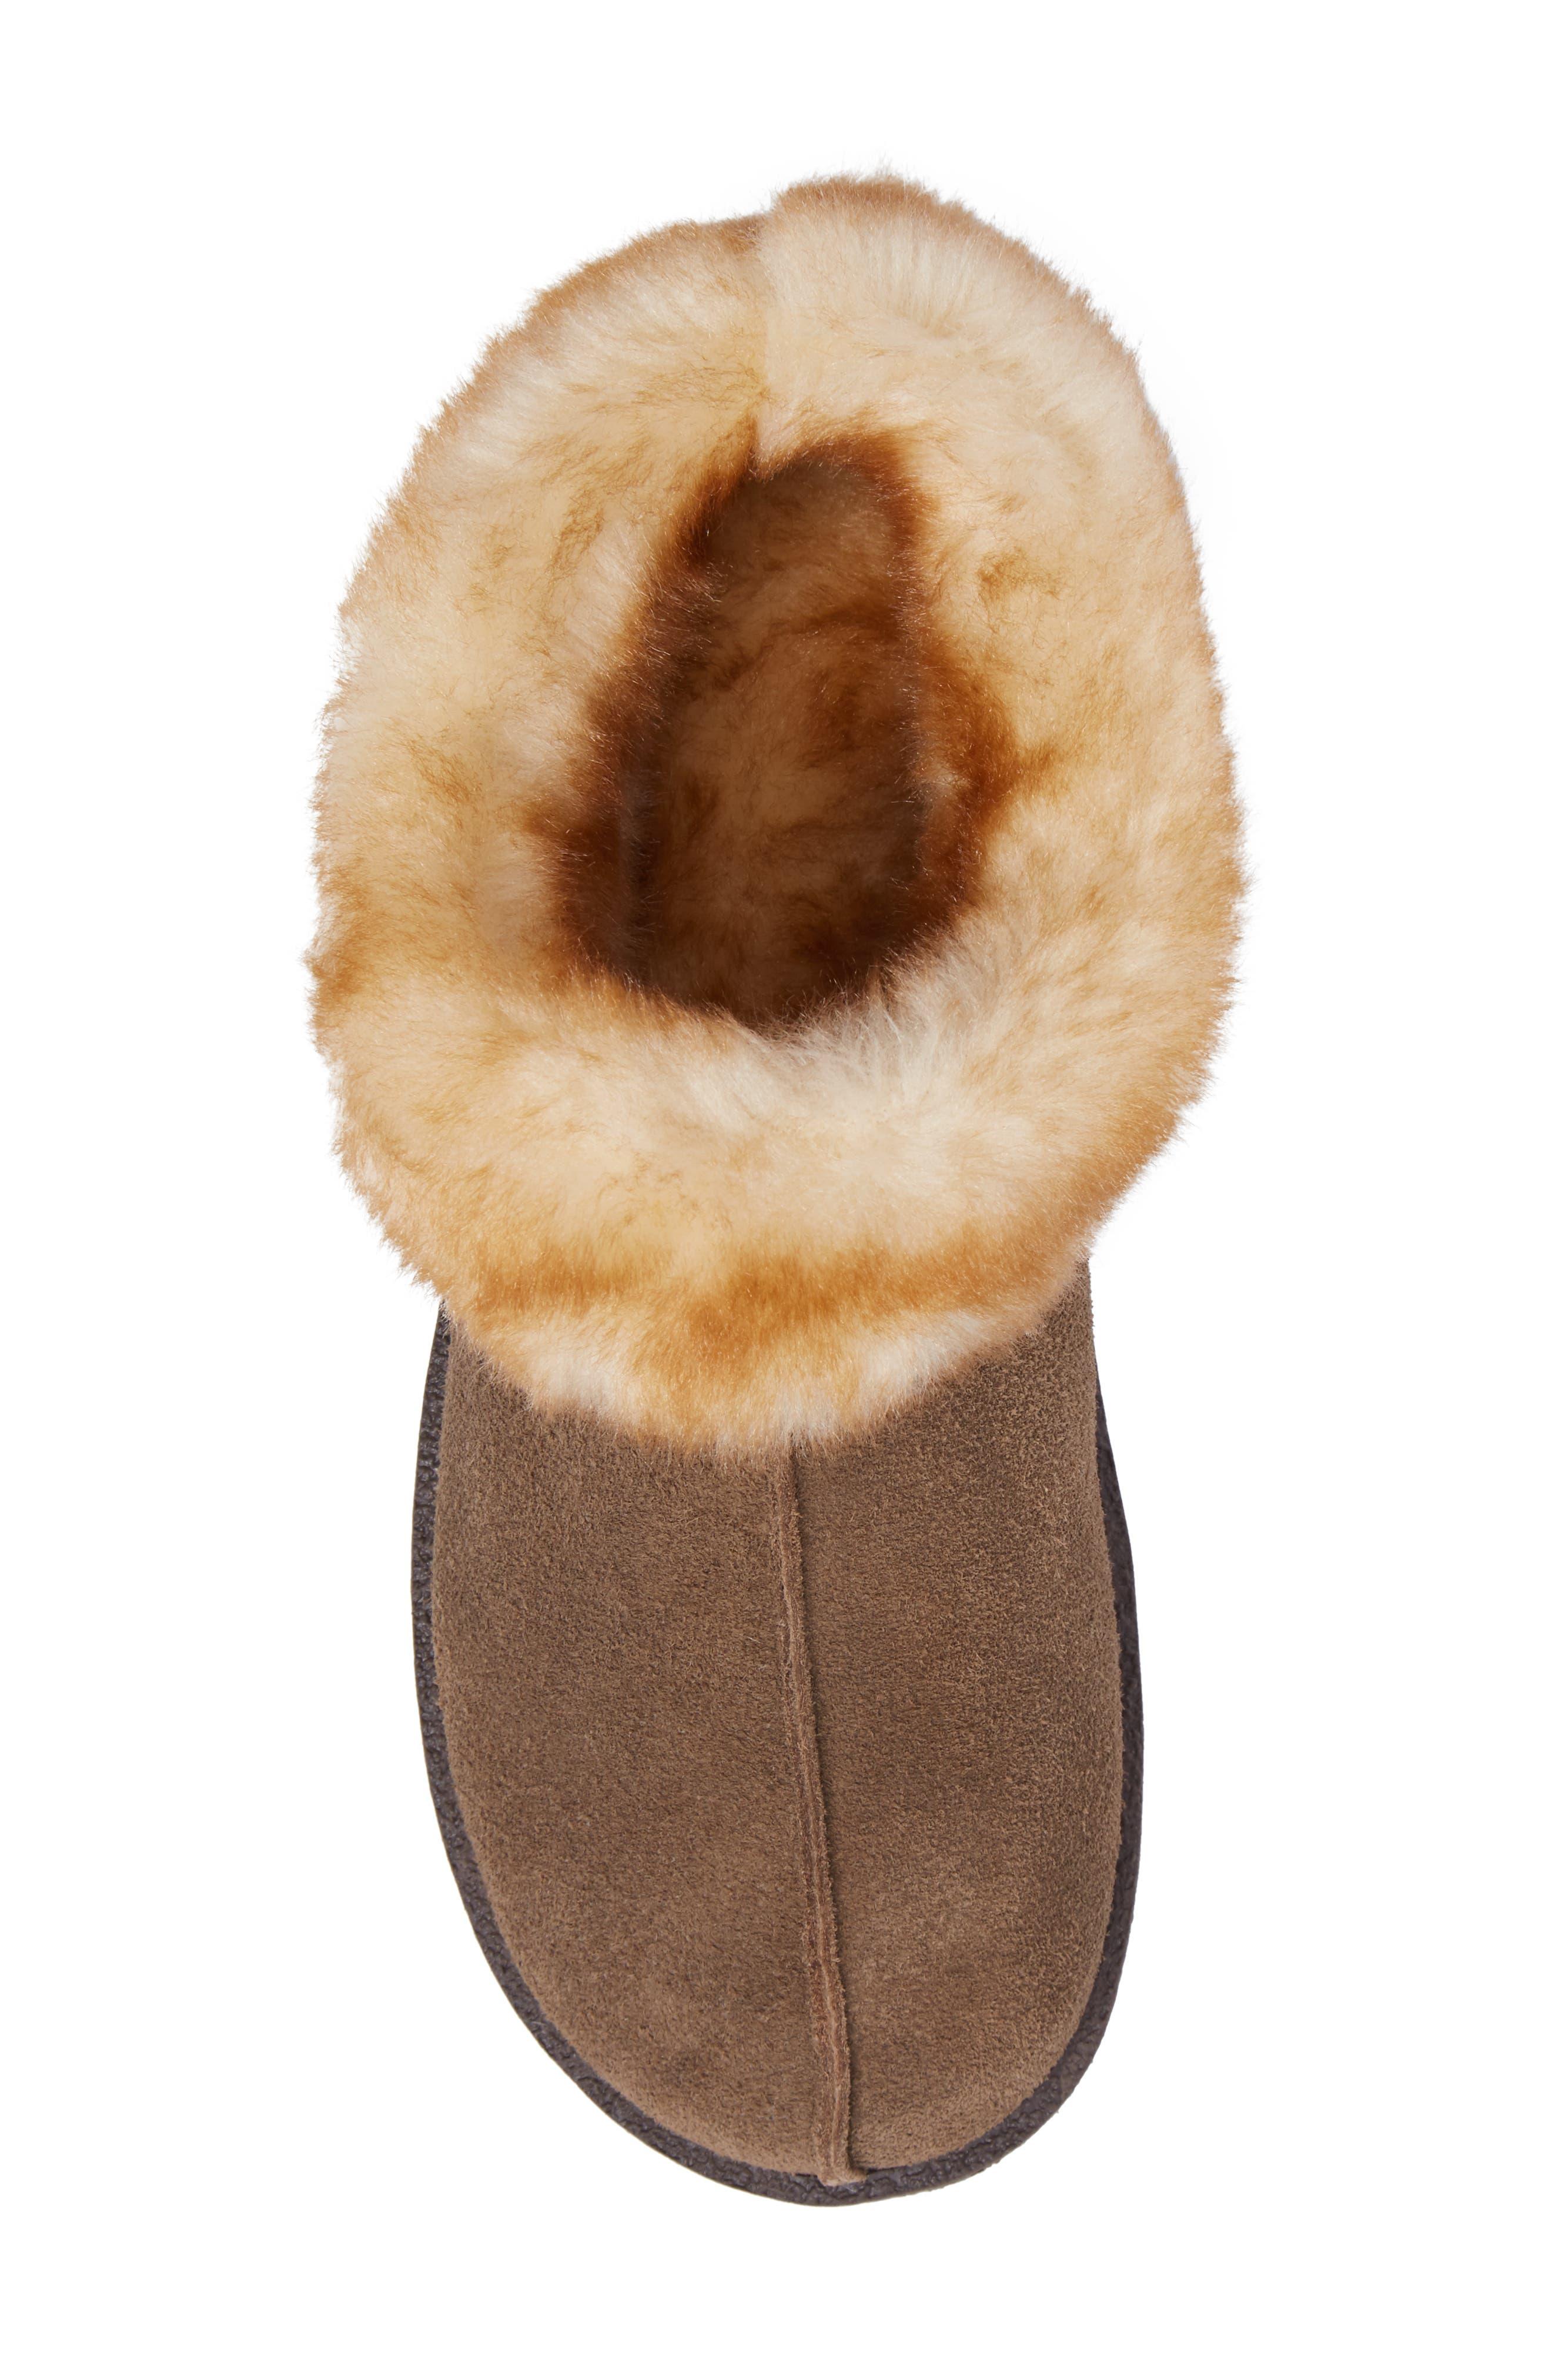 Autumn Ridge II Faux Fur Slipper Bootie,                             Alternate thumbnail 5, color,                             Walnut Suede